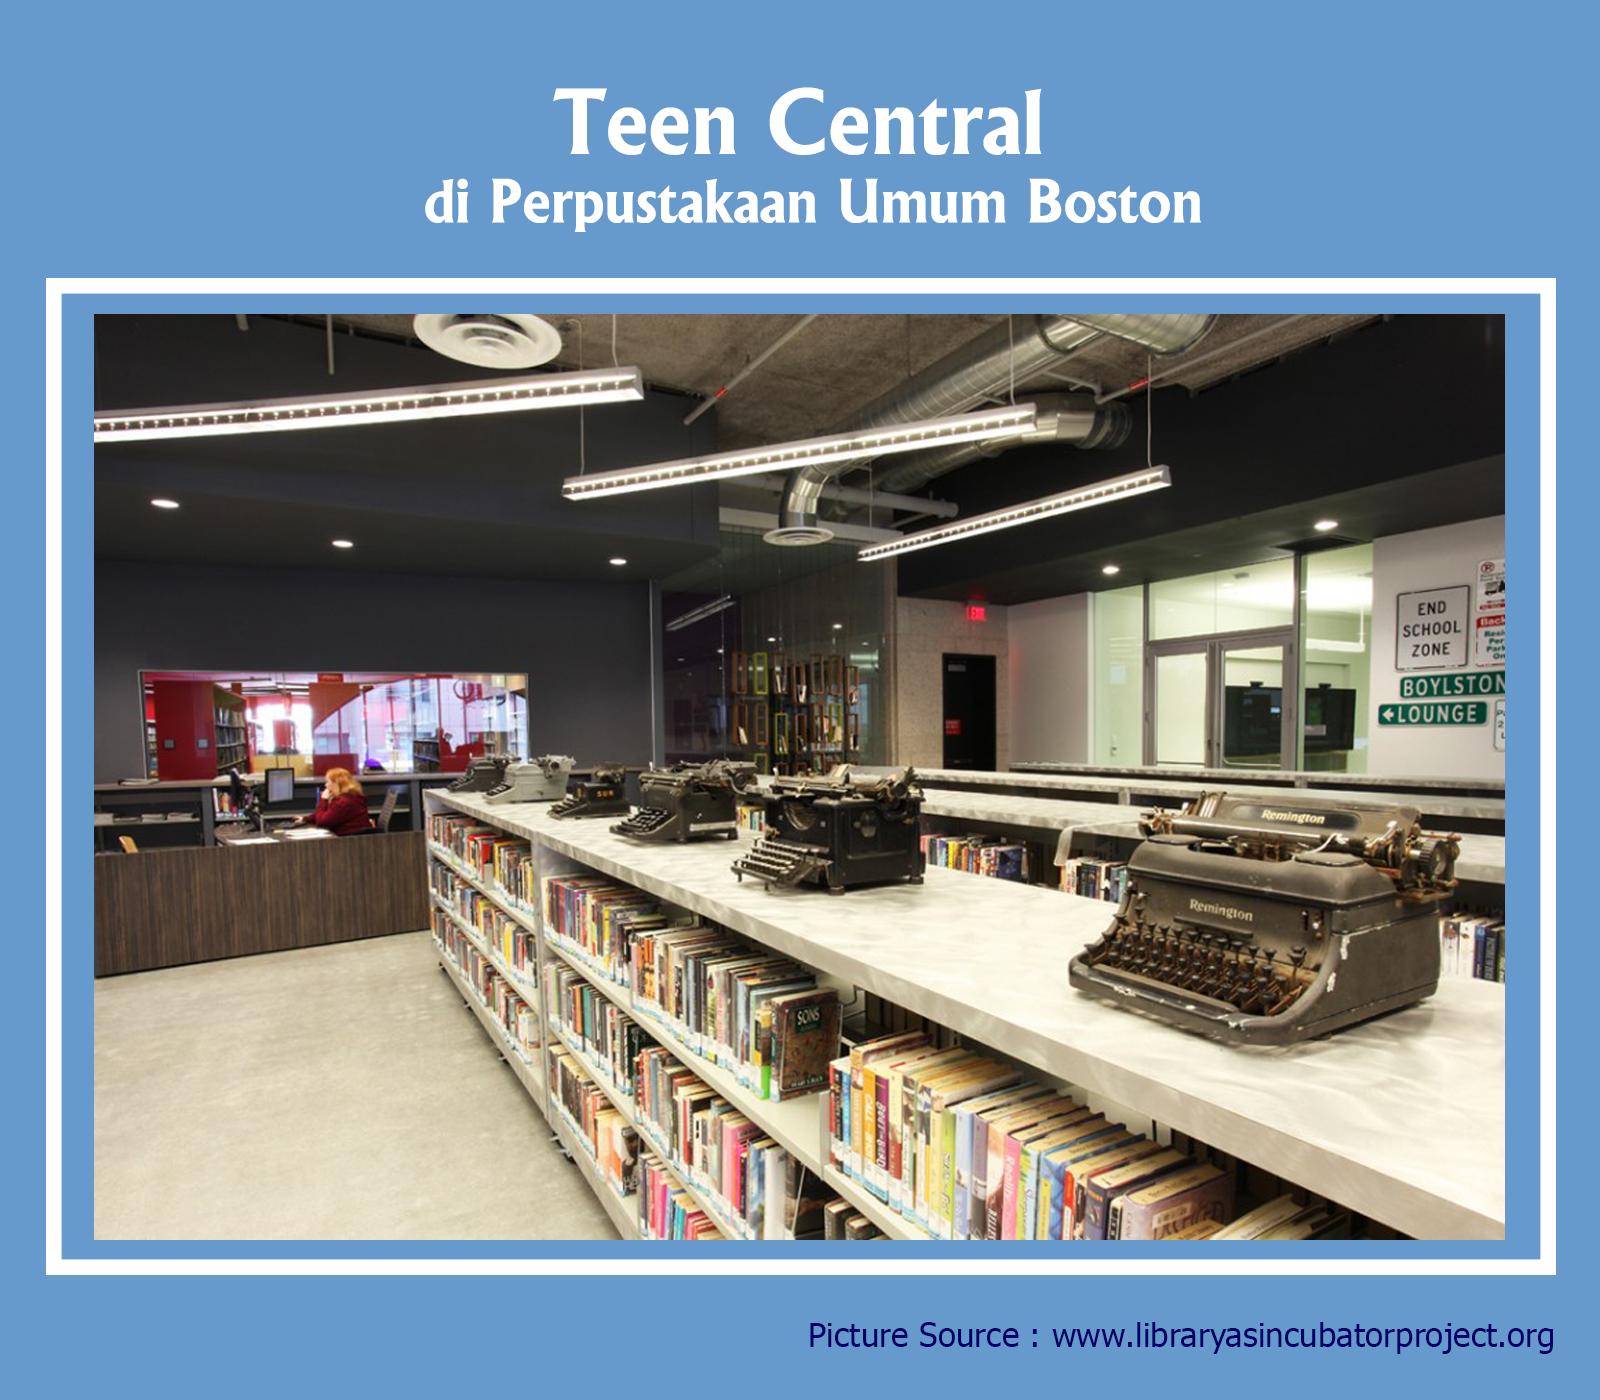 Teen central BPL3